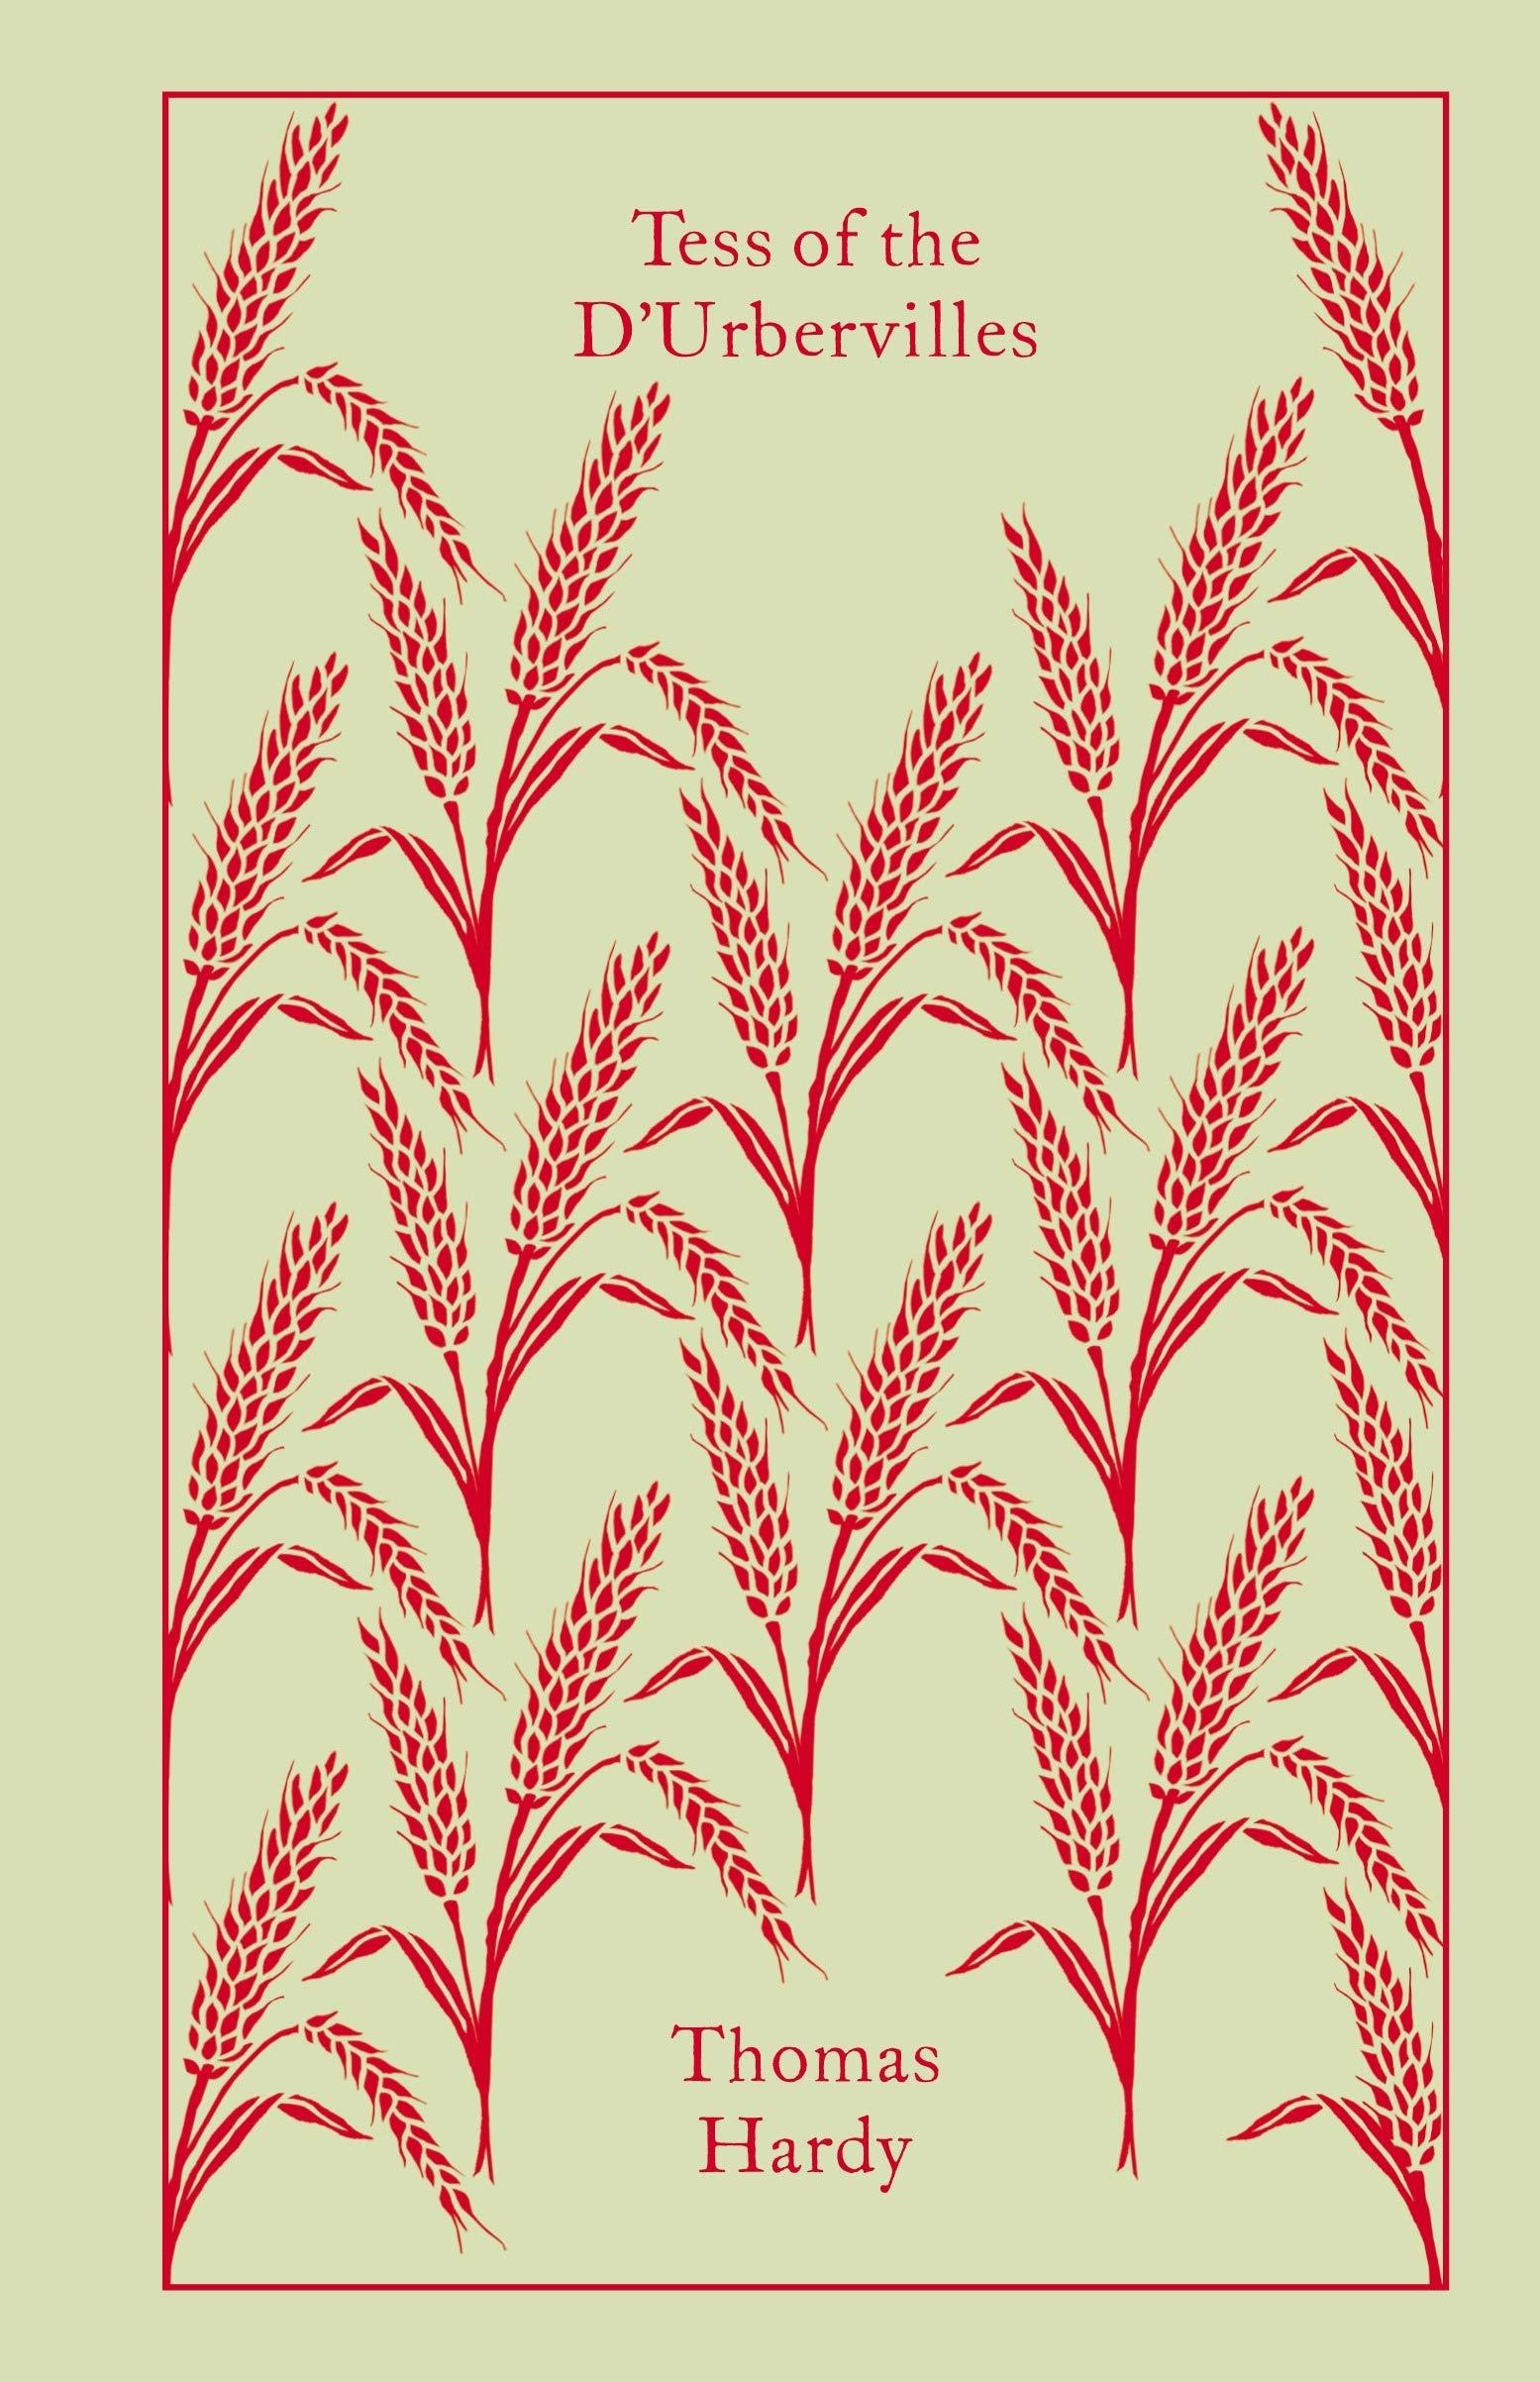 Tess of the D'Urbervilles (Penguin Clothbound Classics)